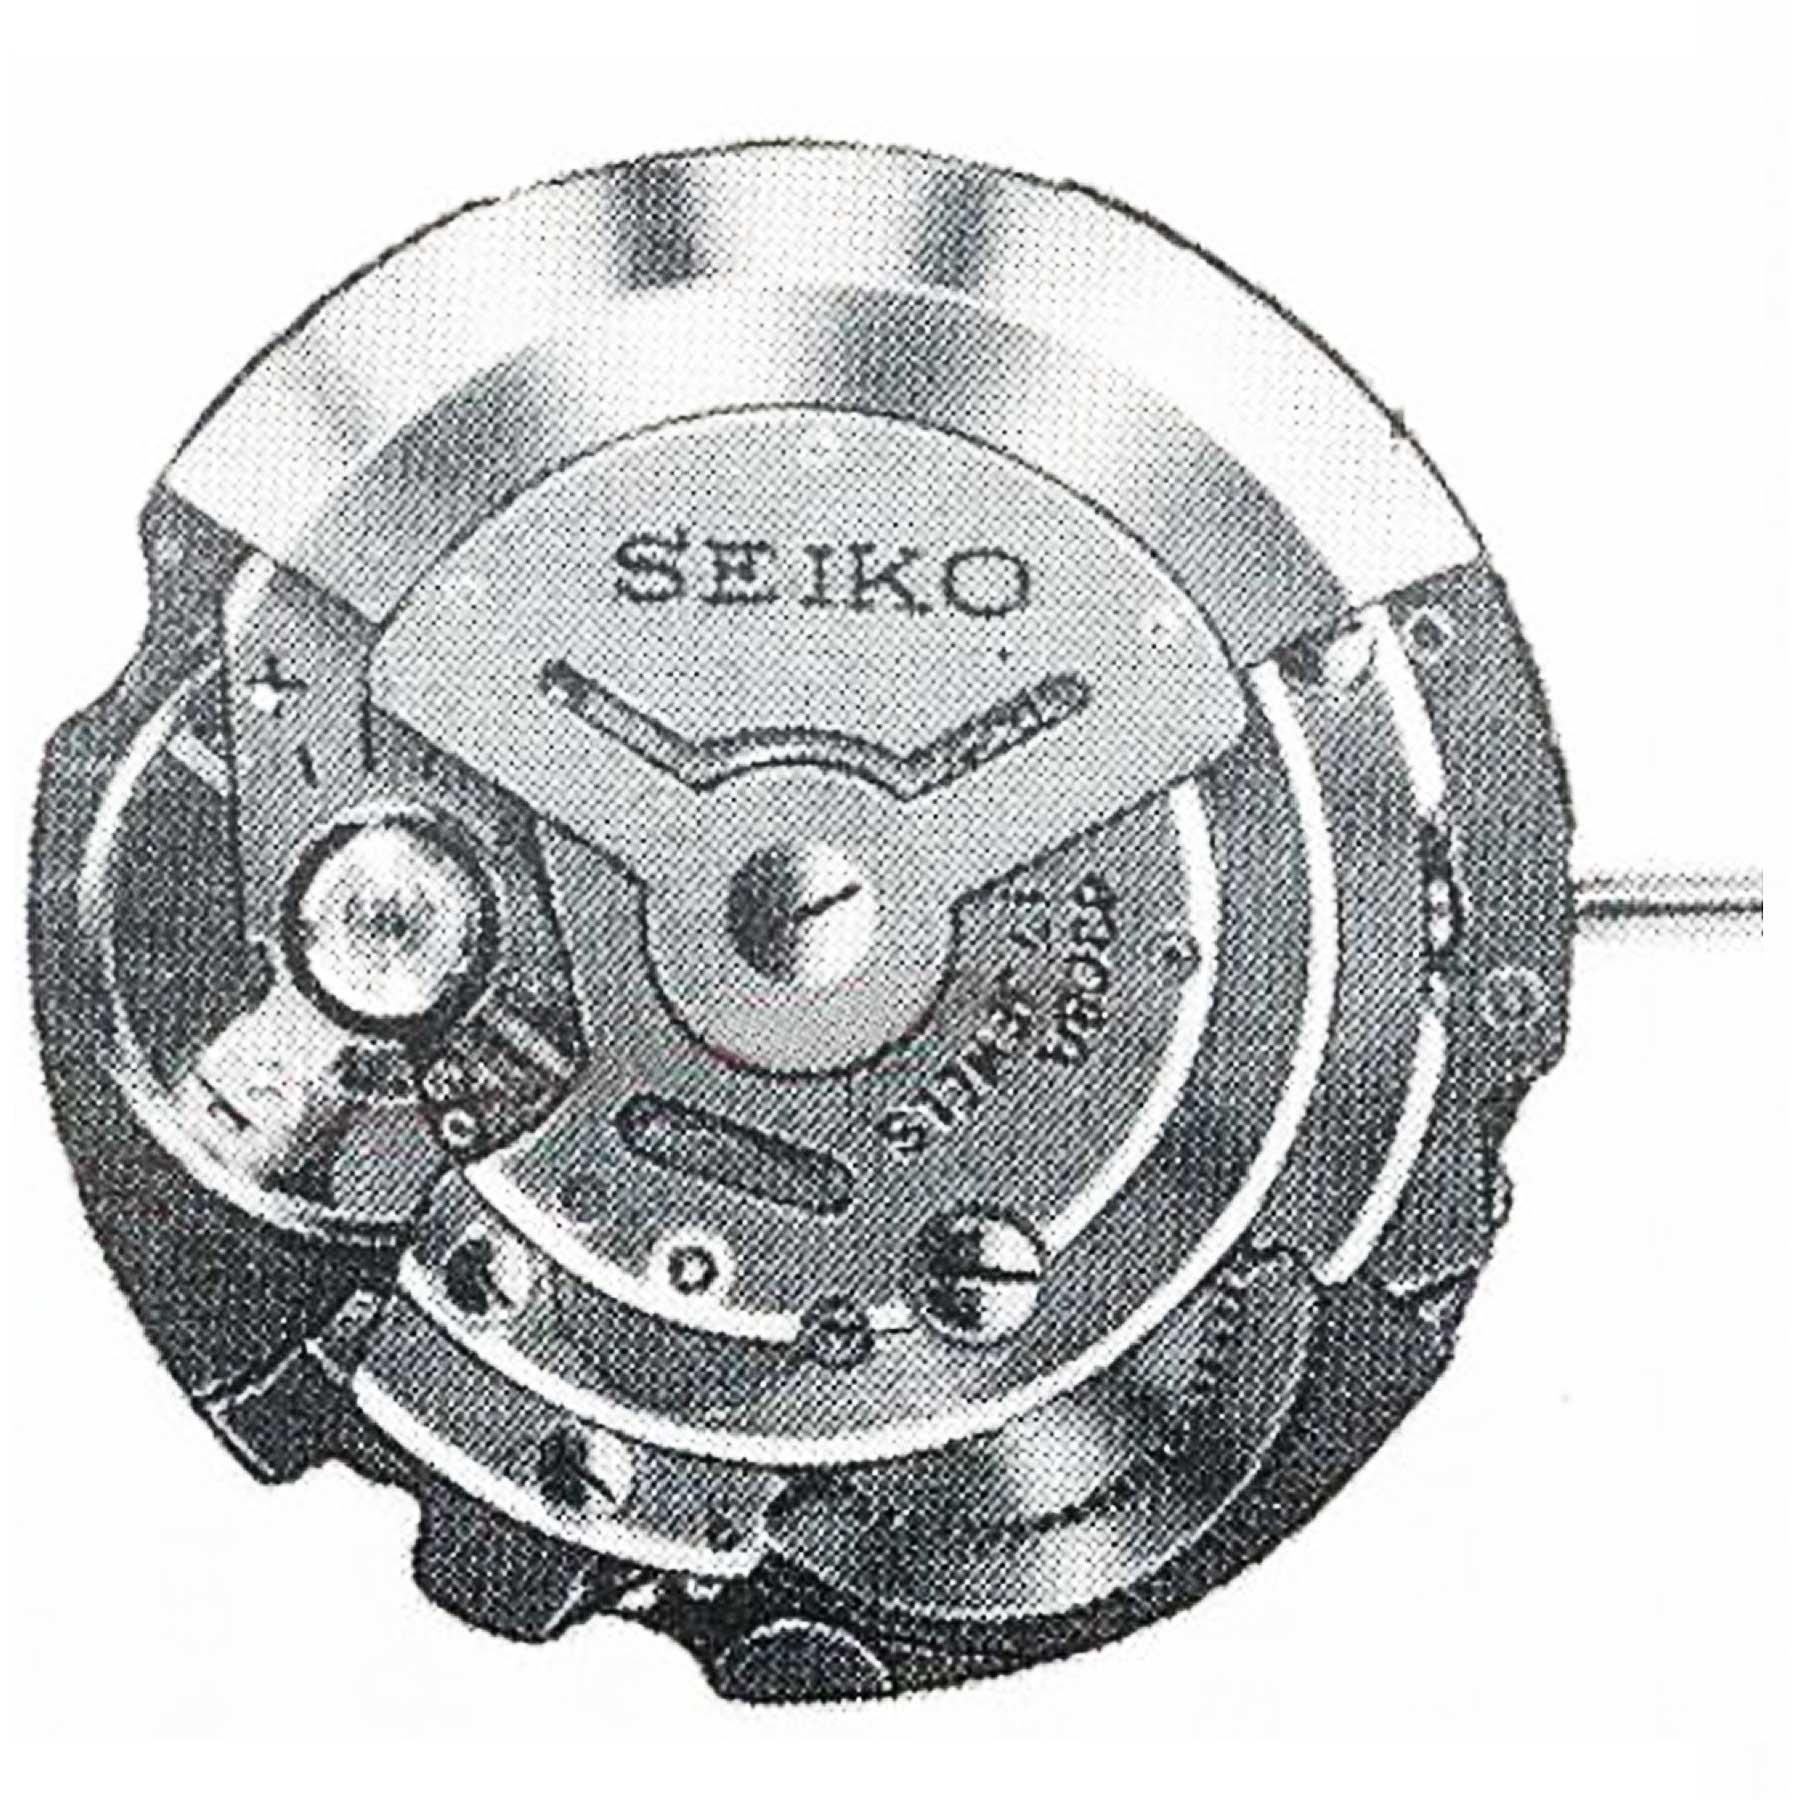 Seiko Caliber 6308